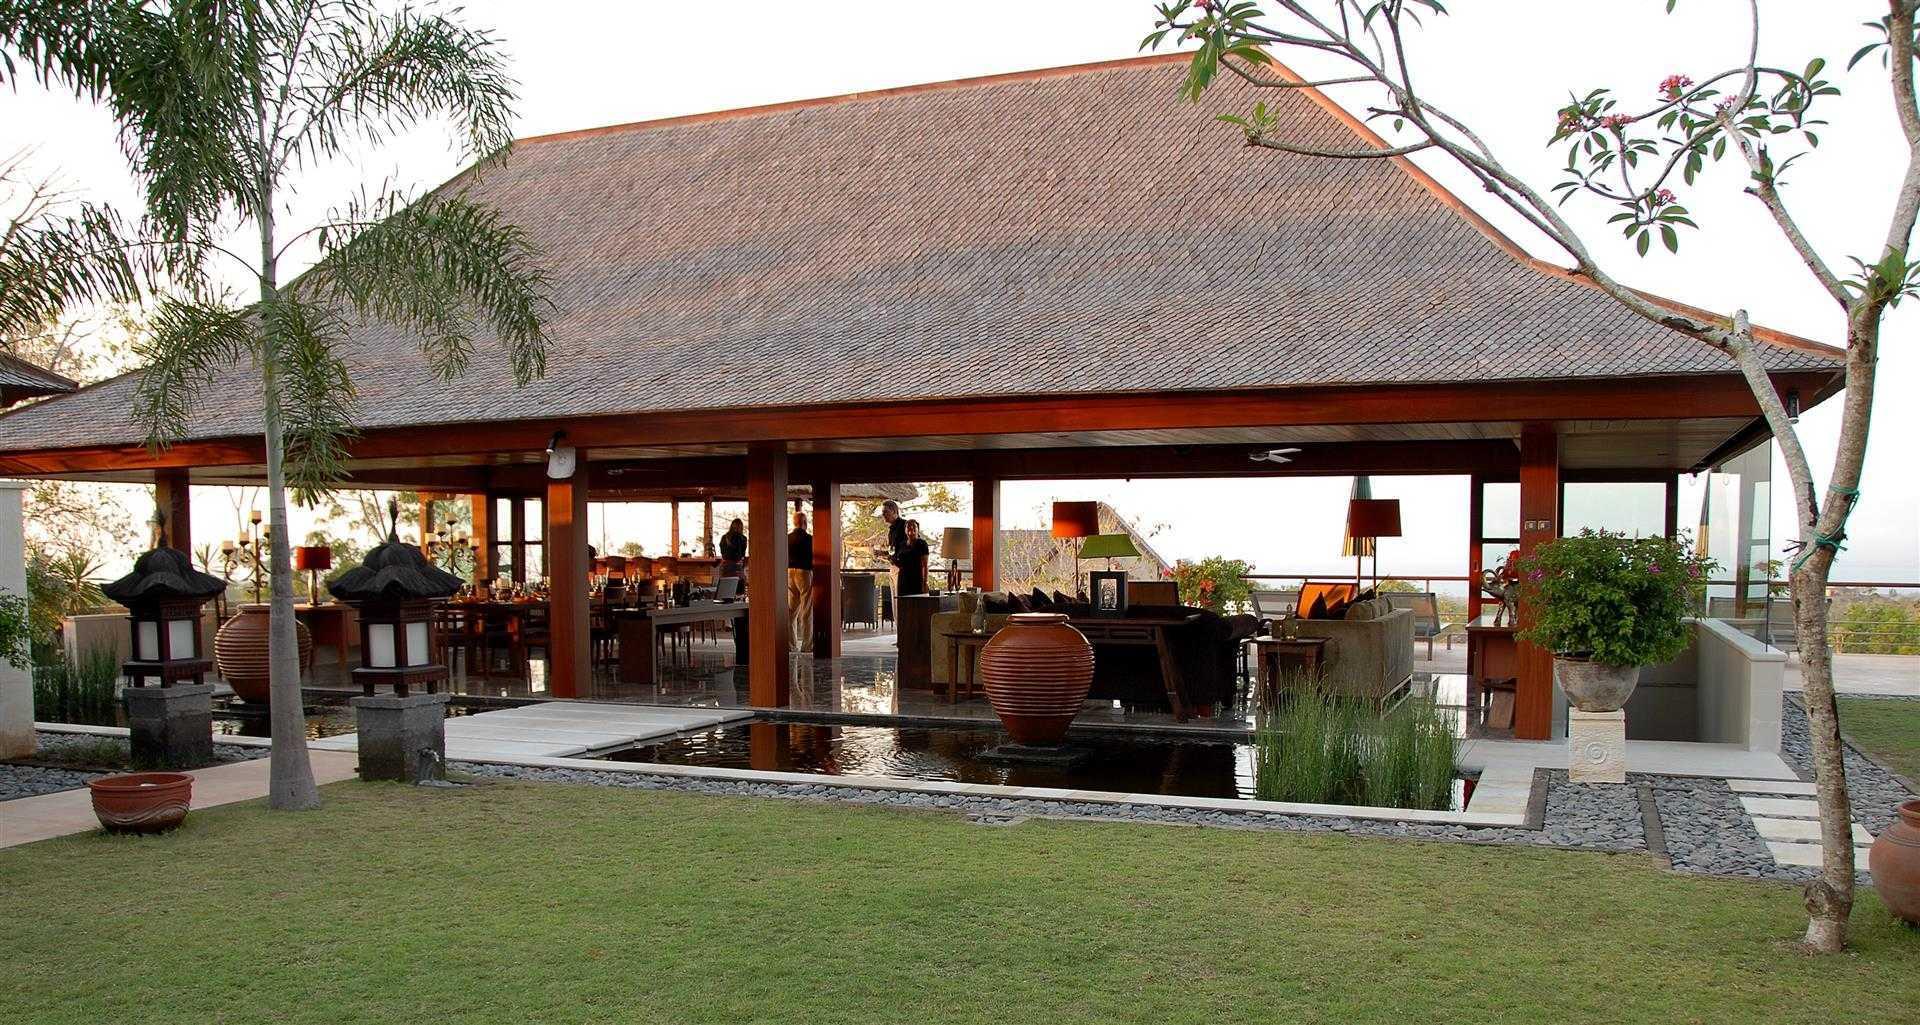 Agung Budi Raharsa | Architecture & Engineering Villa Indah Manis - Bali Bali, Indonesia Pecatu, Bali Main Building   12410